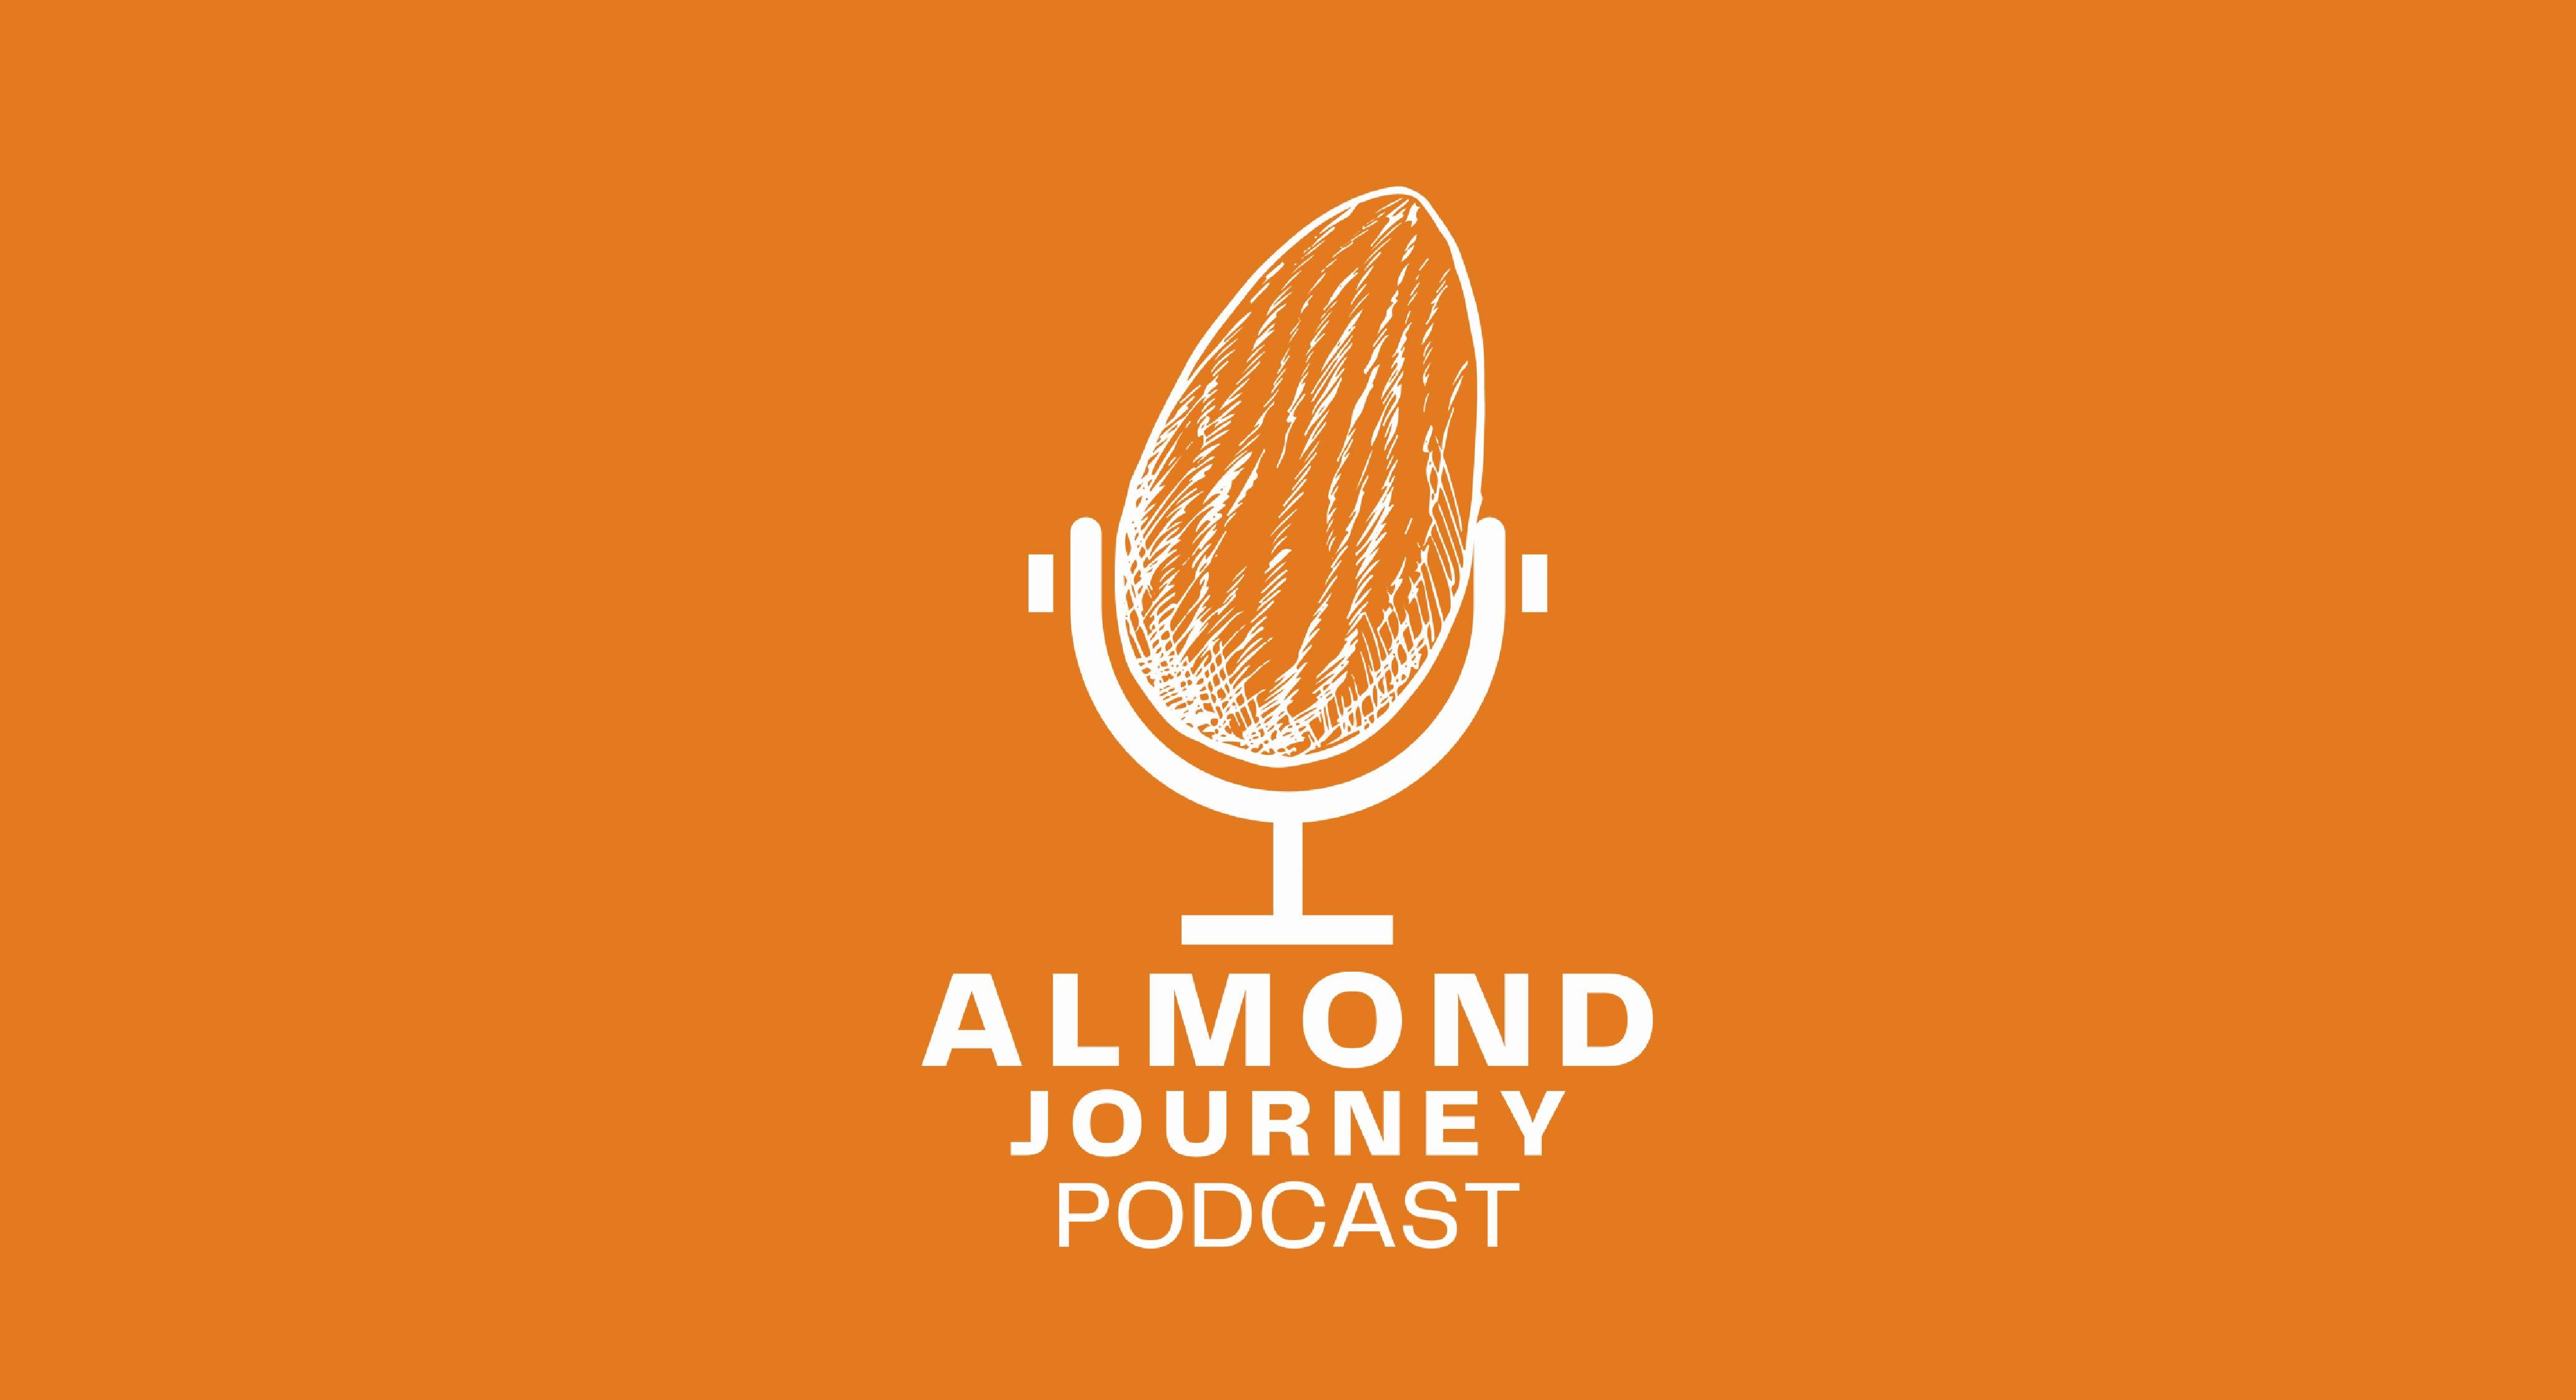 almondjourney-01_2.jpg